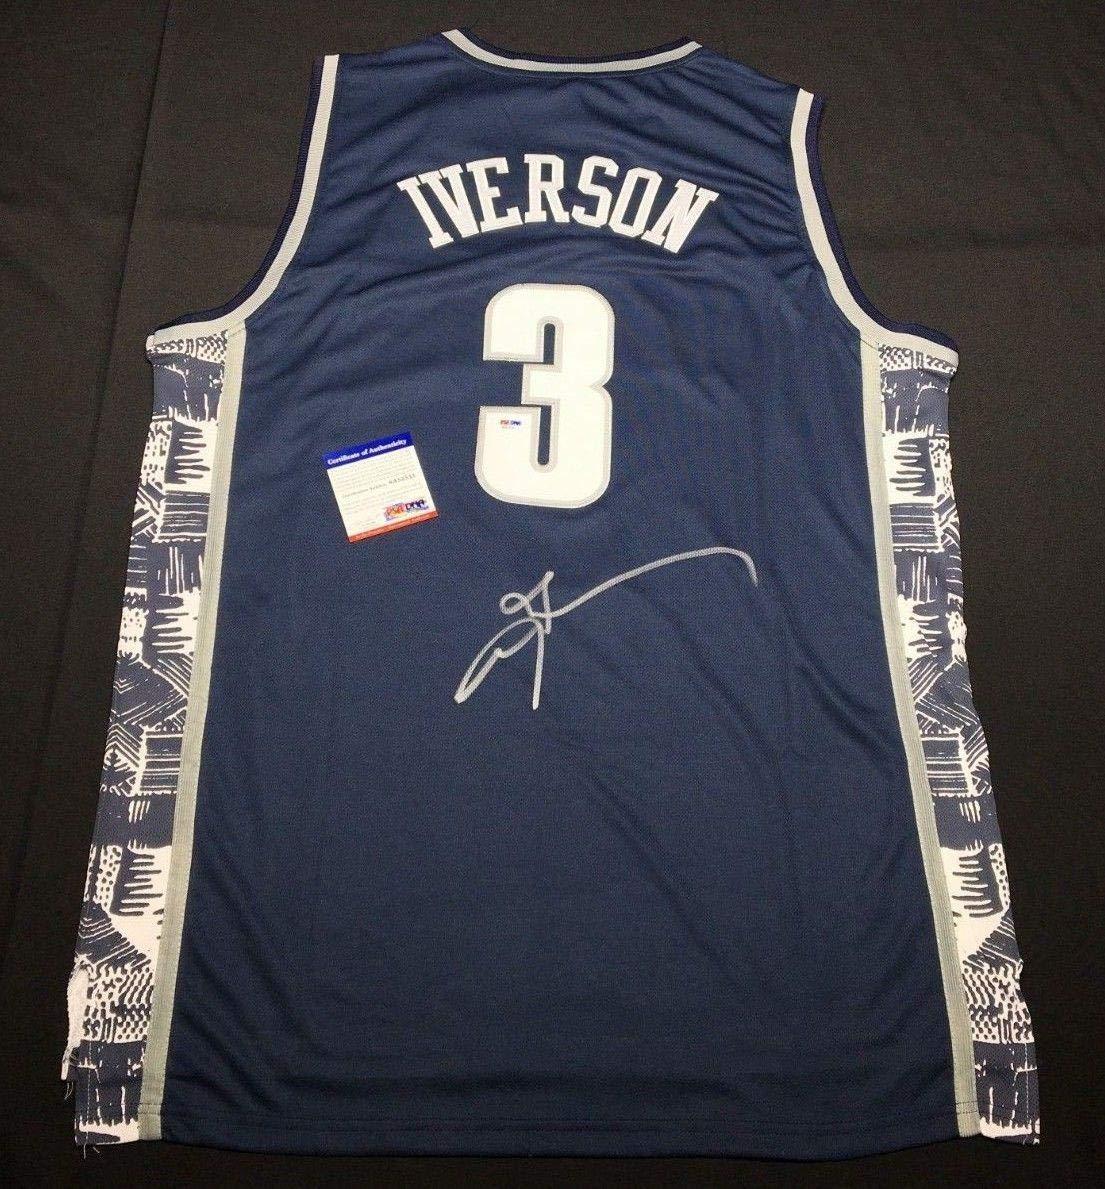 hot sale online fd56f 97f42 Allen IversonSigned Georgetown Hoyas Basketball Jersey ...